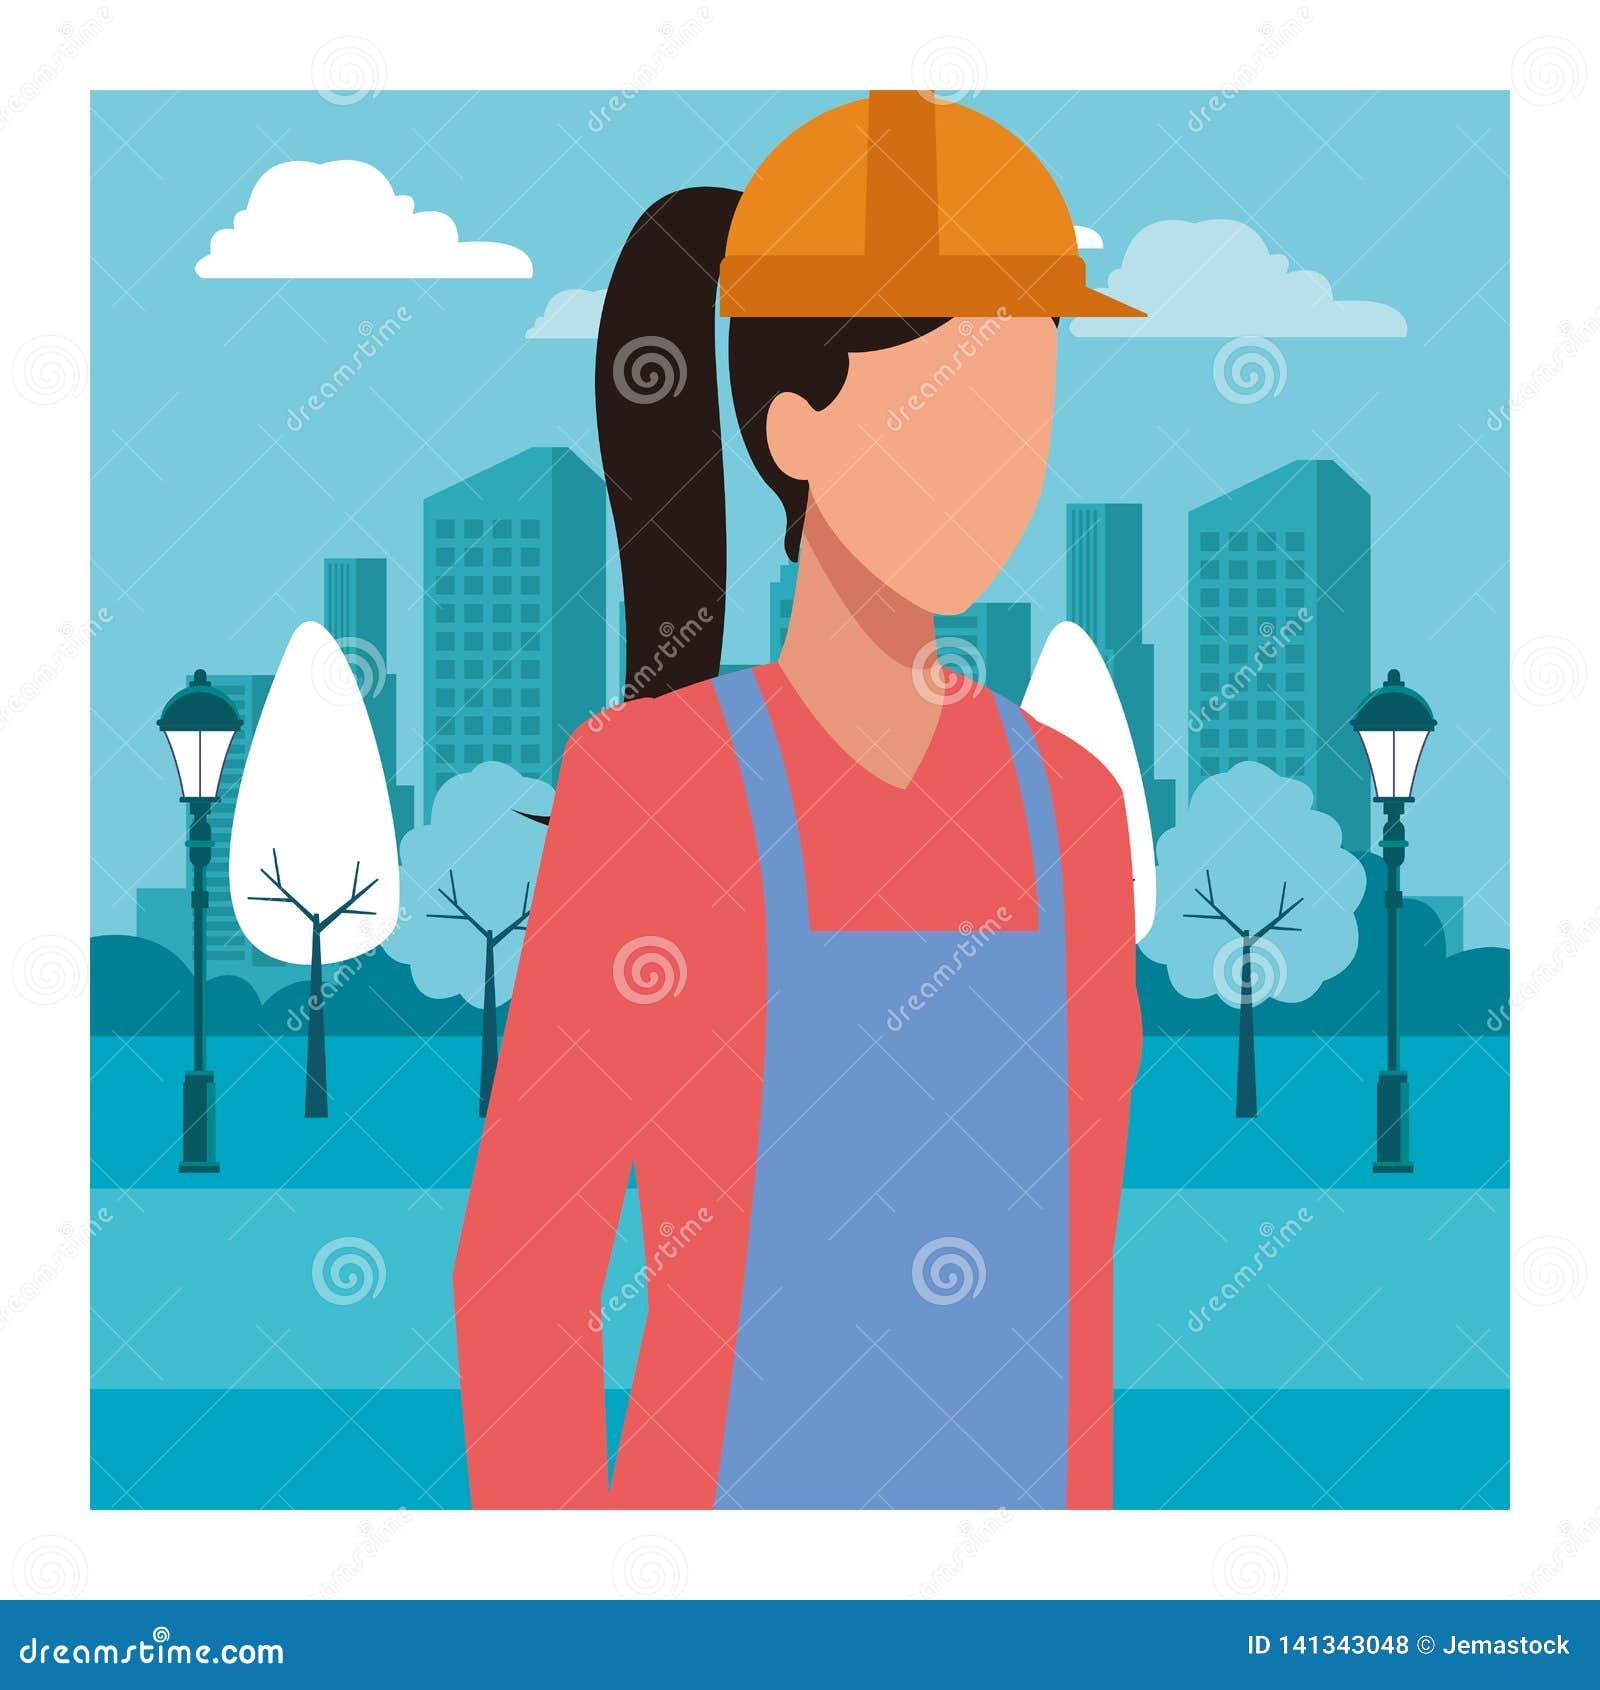 BauArbeitnehmerin-Arbeitskraftavatara